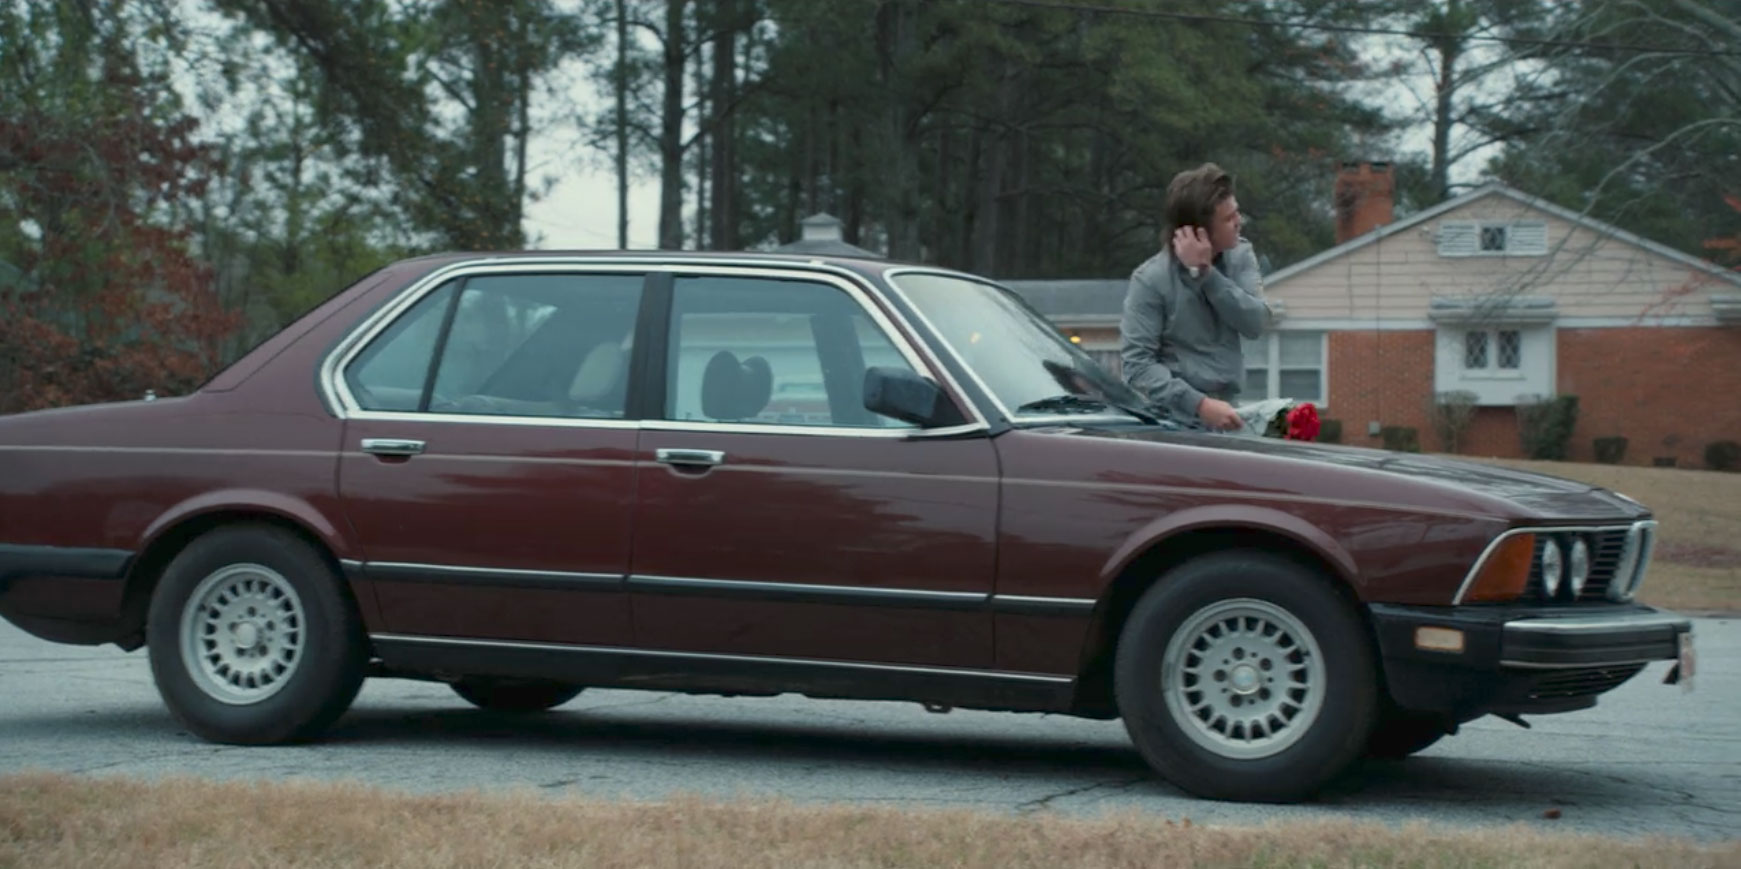 1980 BMW 733i in Stranger THings